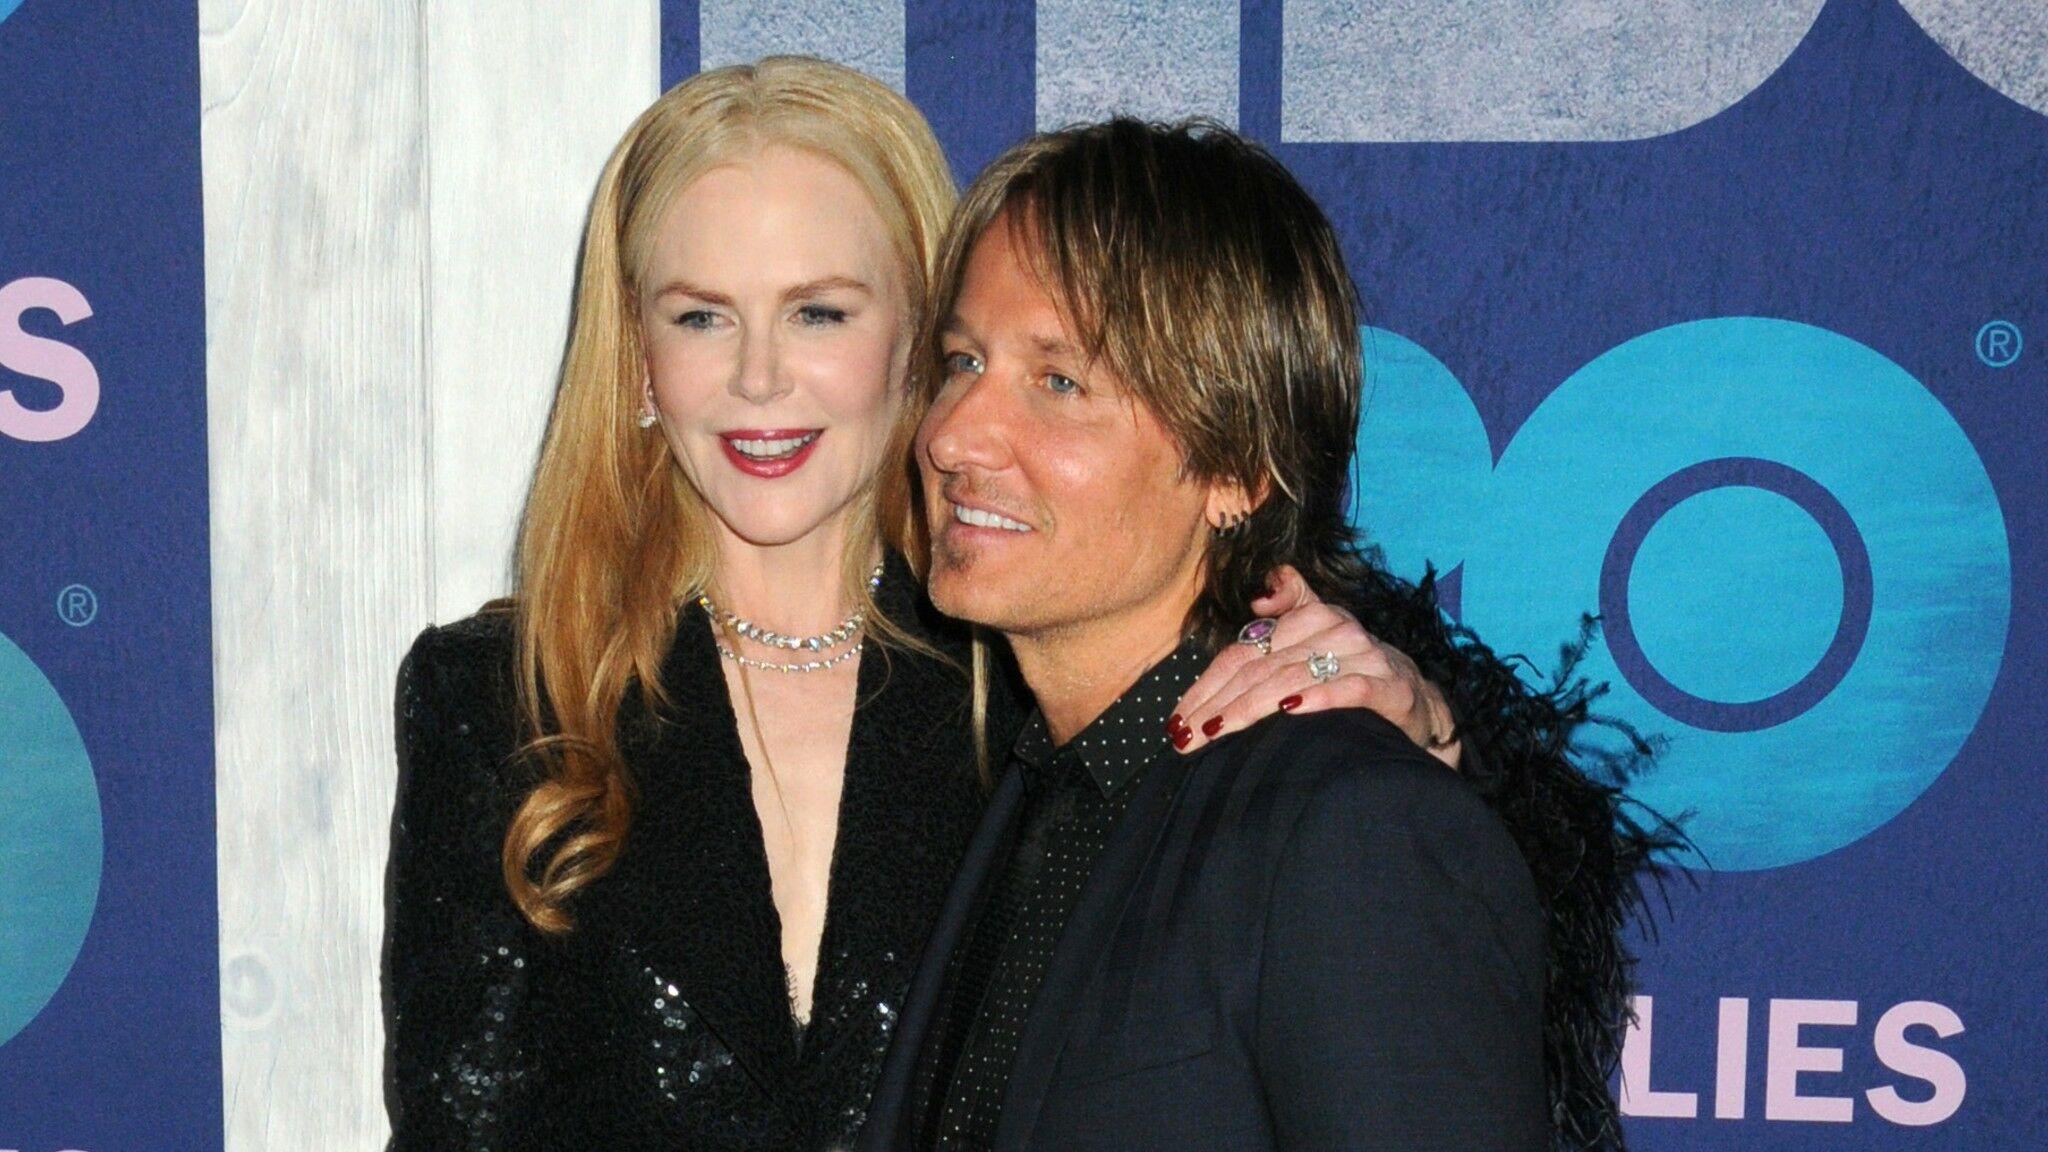 Nicole Kidman et Keith Urban : le couple assume sa vie sexuelle épanouie